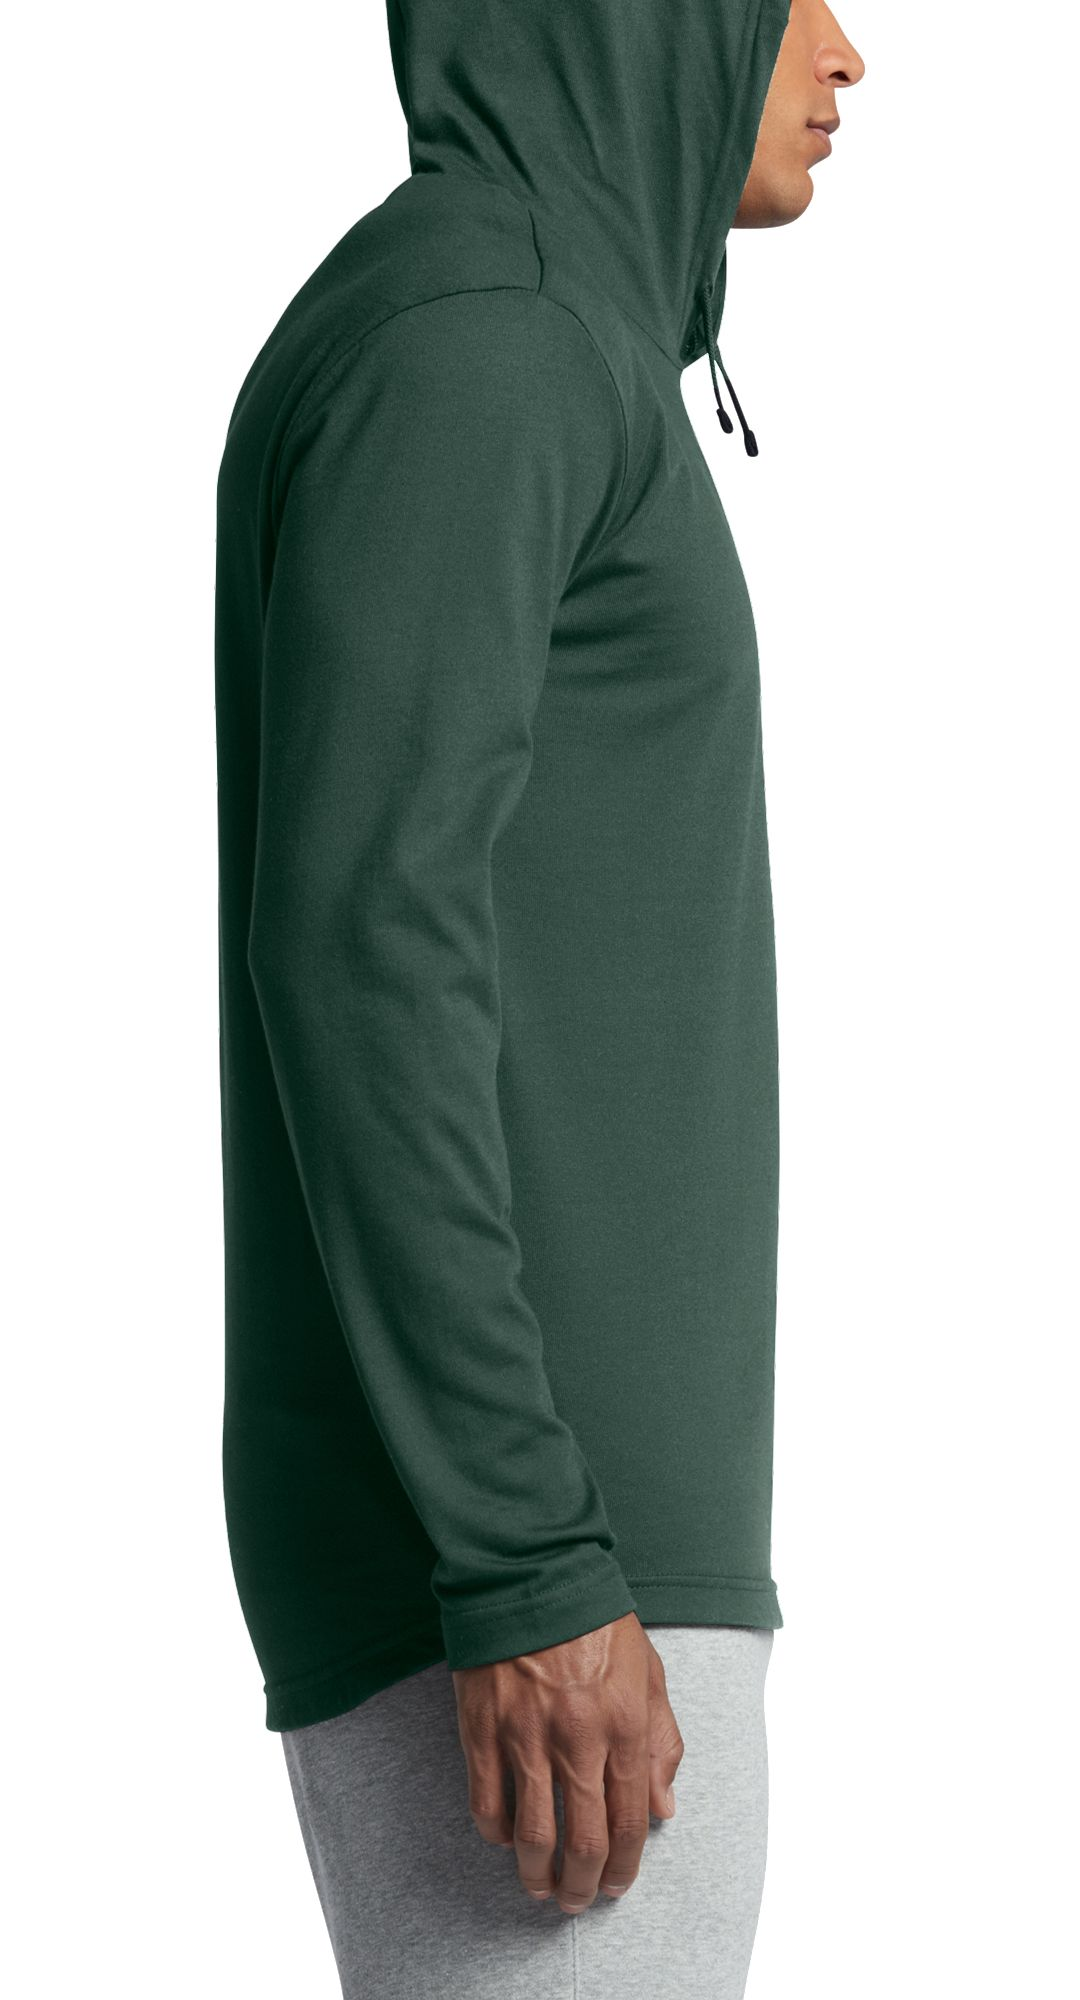 ba42b92ab Nike Men's Jersey Lightweight Pullover Hoodie | DICK'S Sporting Goods